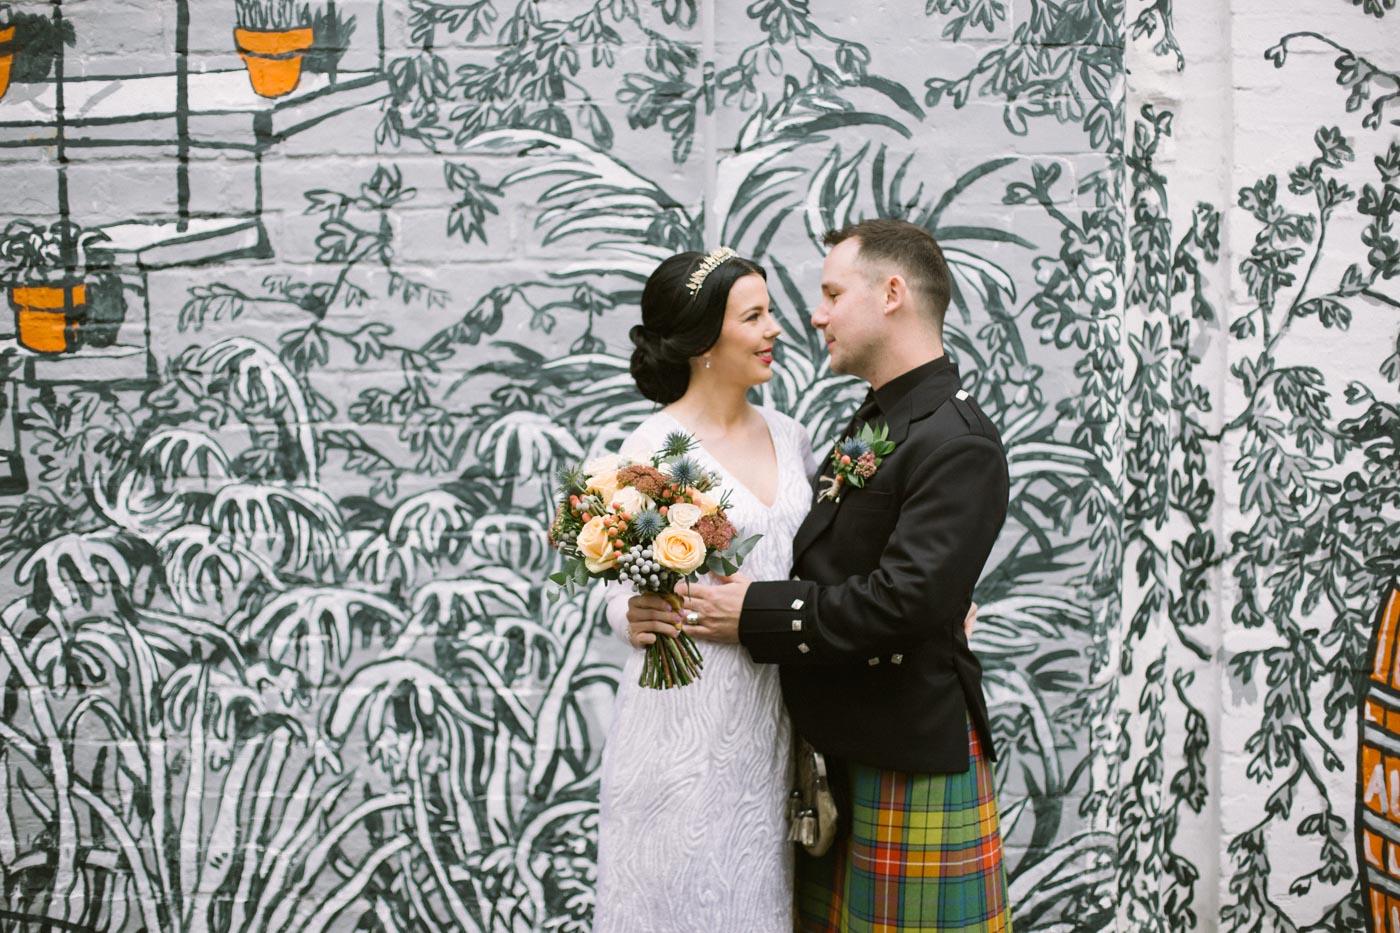 Glasgow Alternative Wedding Photography by Ceranna Photography | Grafitti wall wedding photos inspiration